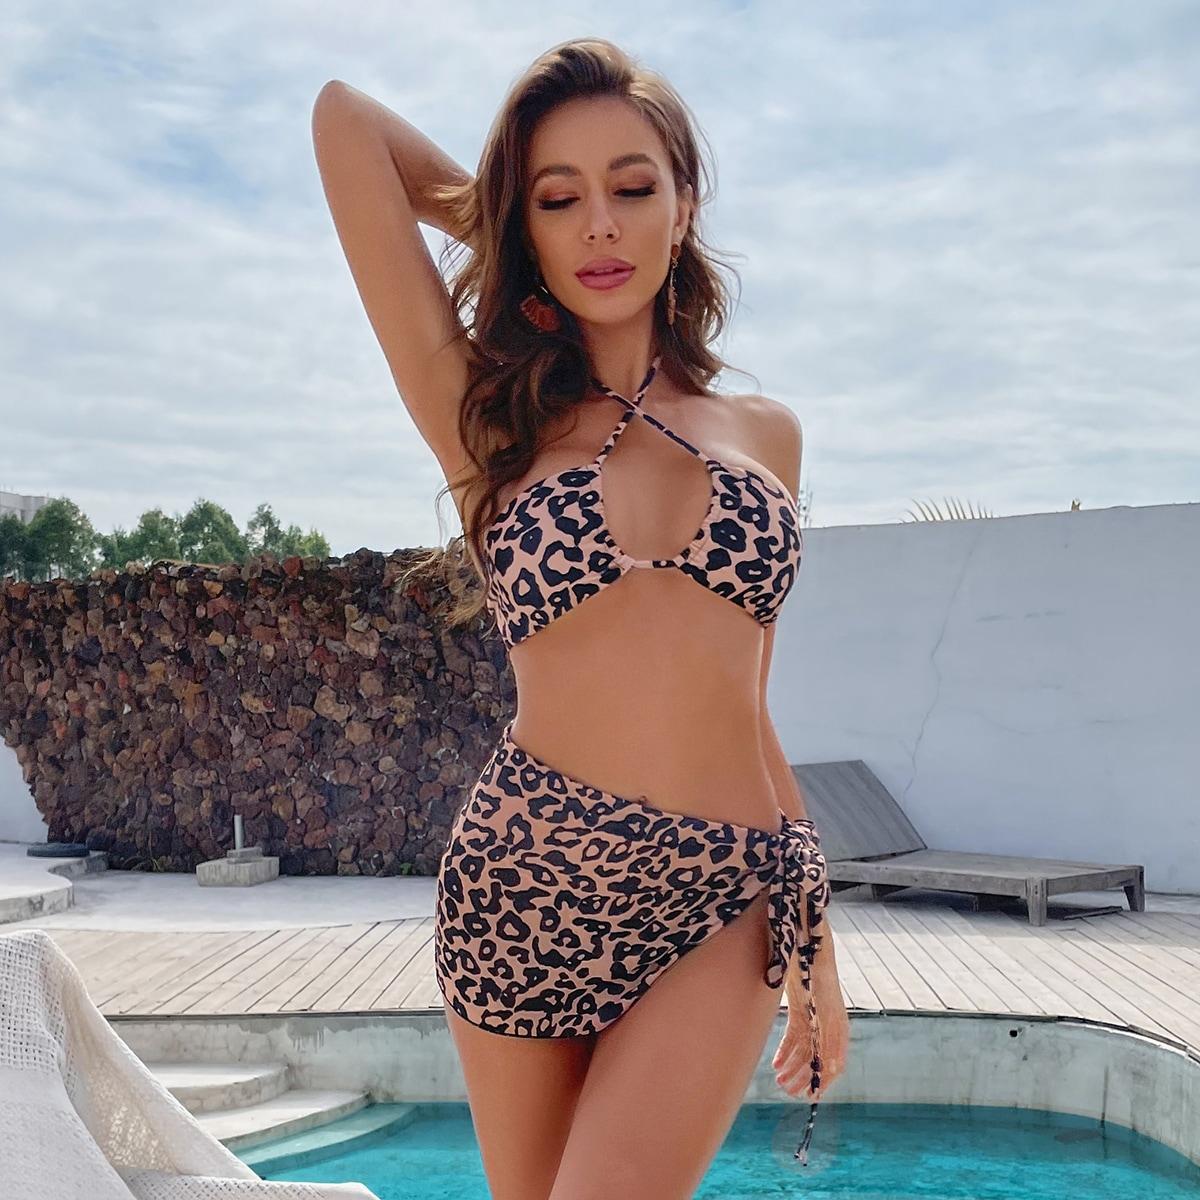 SHEIN / 3pack Leopard Halter Bikini Swimsuit & Beach Skirt